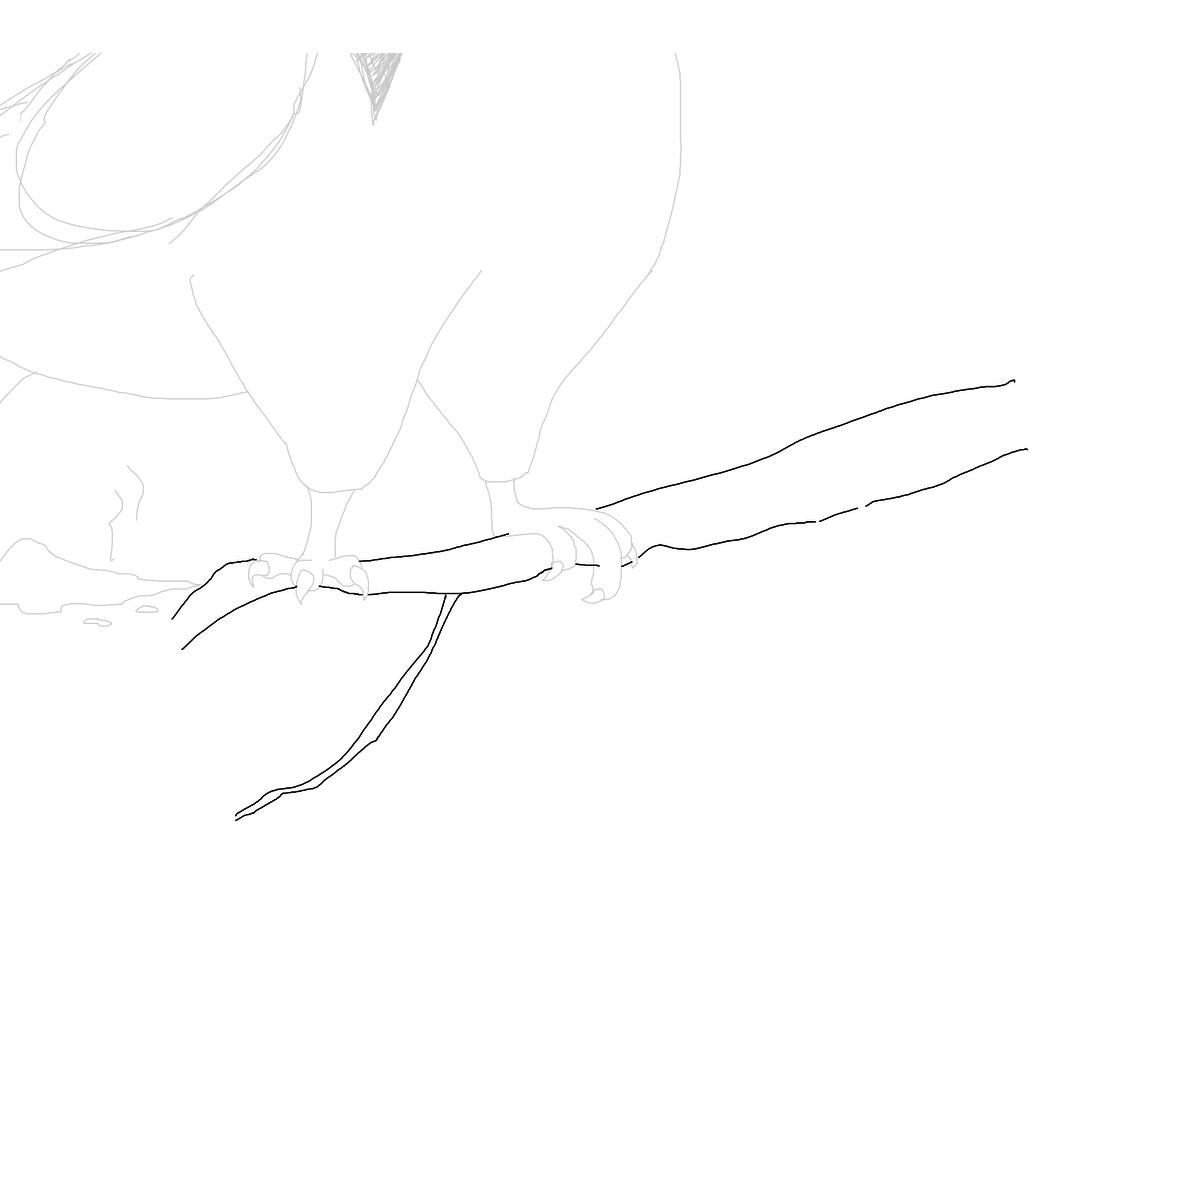 BAAAM drawing#23369 lat:41.9478111267089840lng: -87.6557769775390600